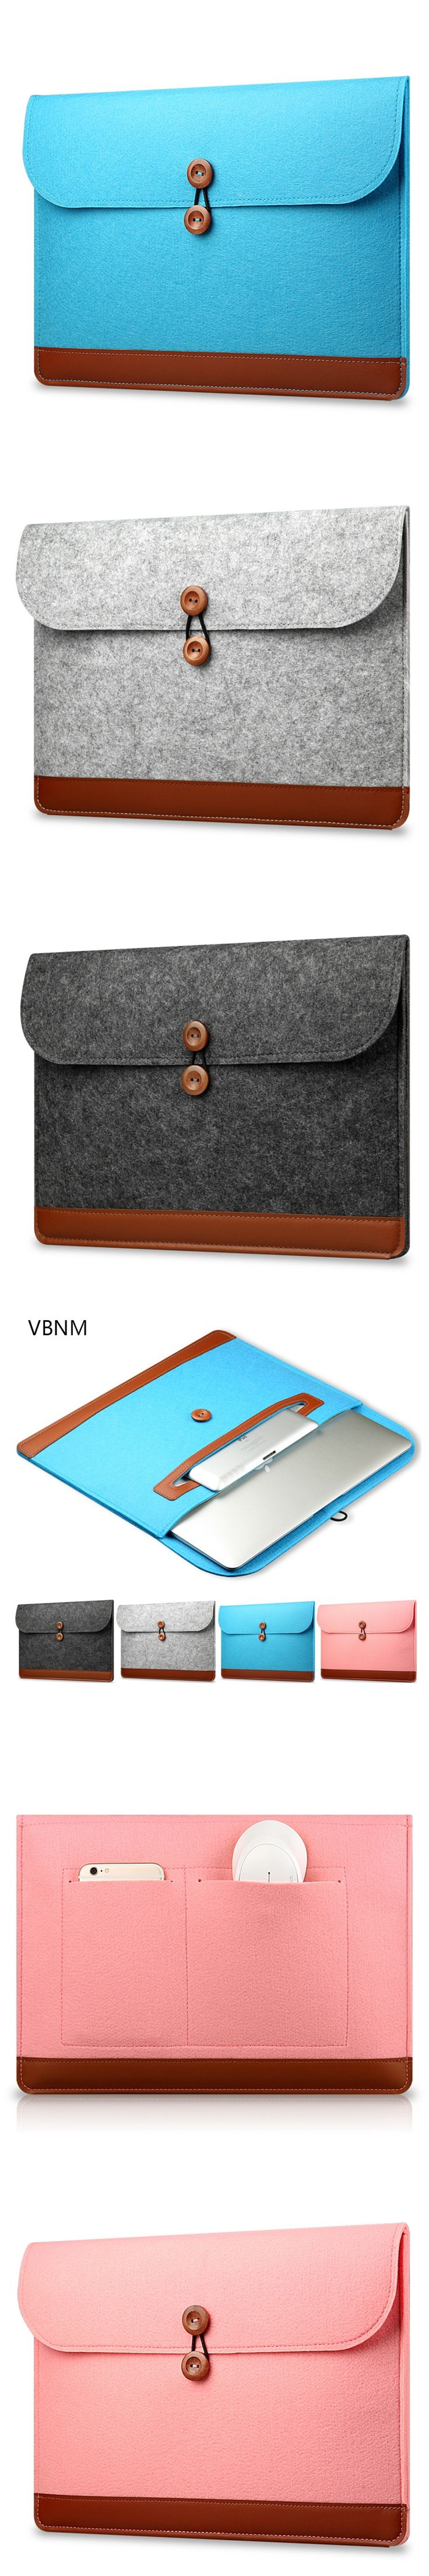 VBNM Wool Felt Laptop Sleeve Bag for Macbook Air Pro Retina 11.6 13.3 15.4 Inch Briefcase Liner Laptop Bag for Macbook Air 13